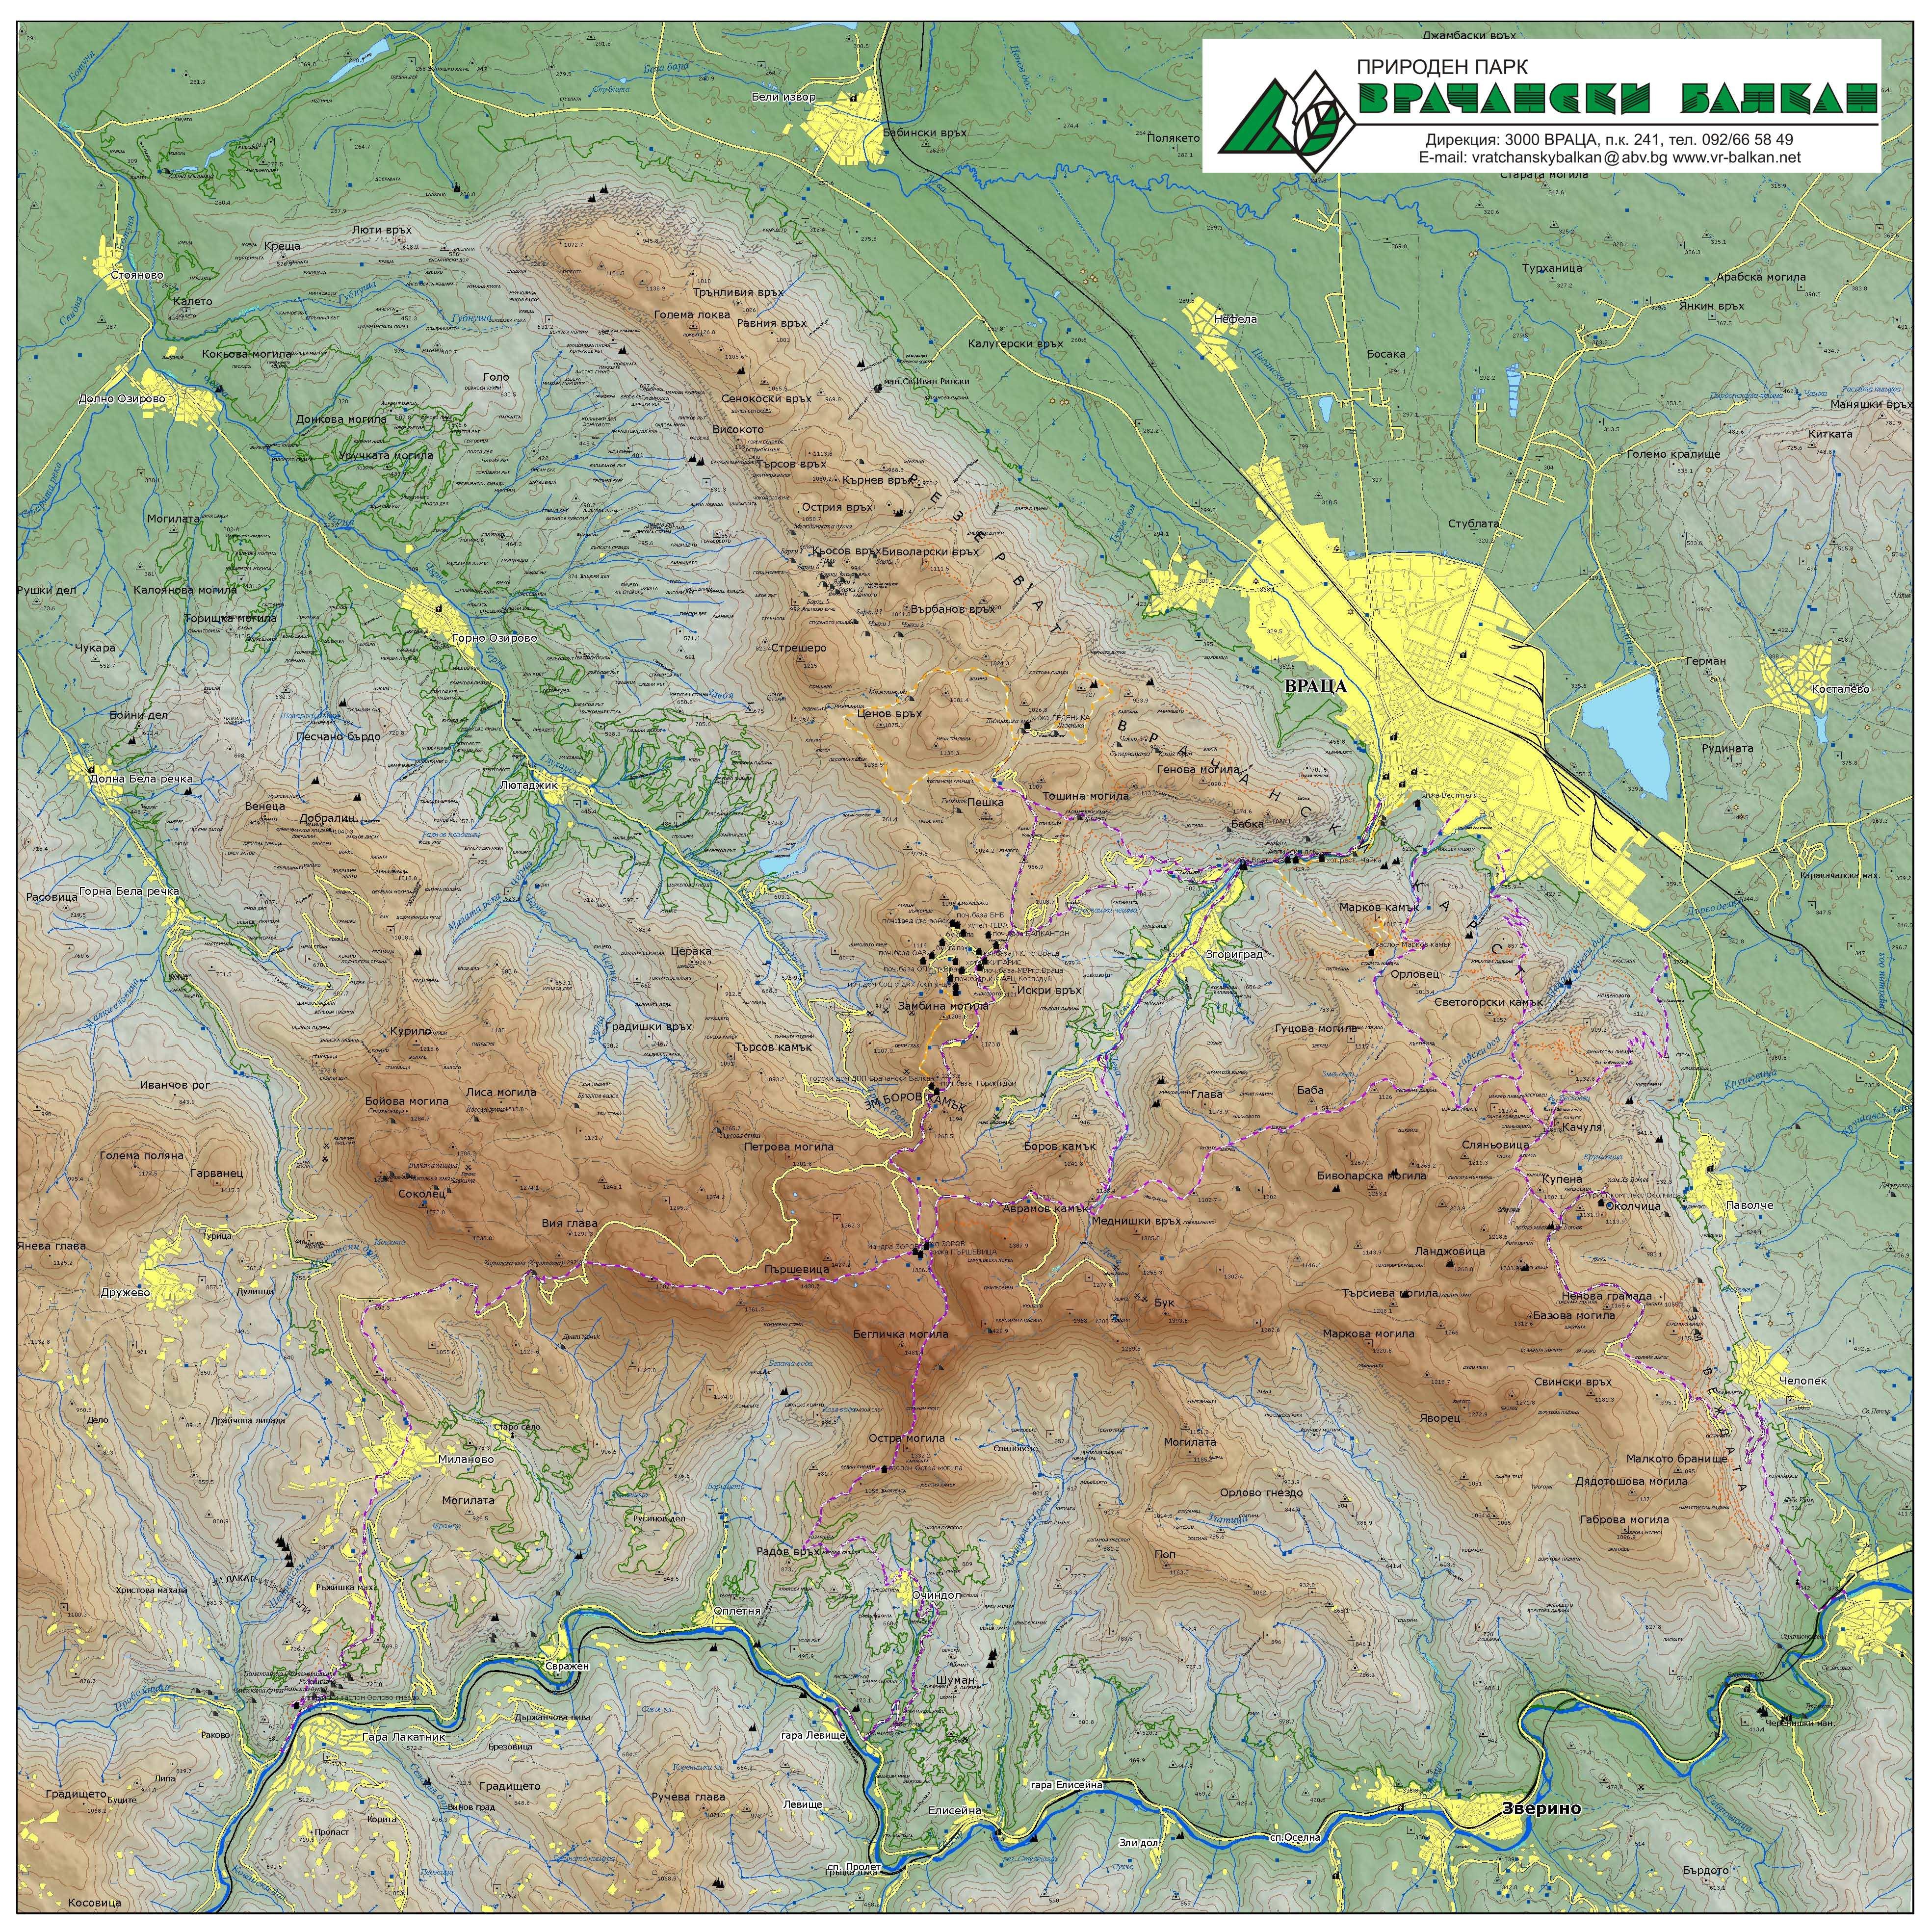 Karta Na Parka Direkciya Na Priroden Park Vrachanski Balkan